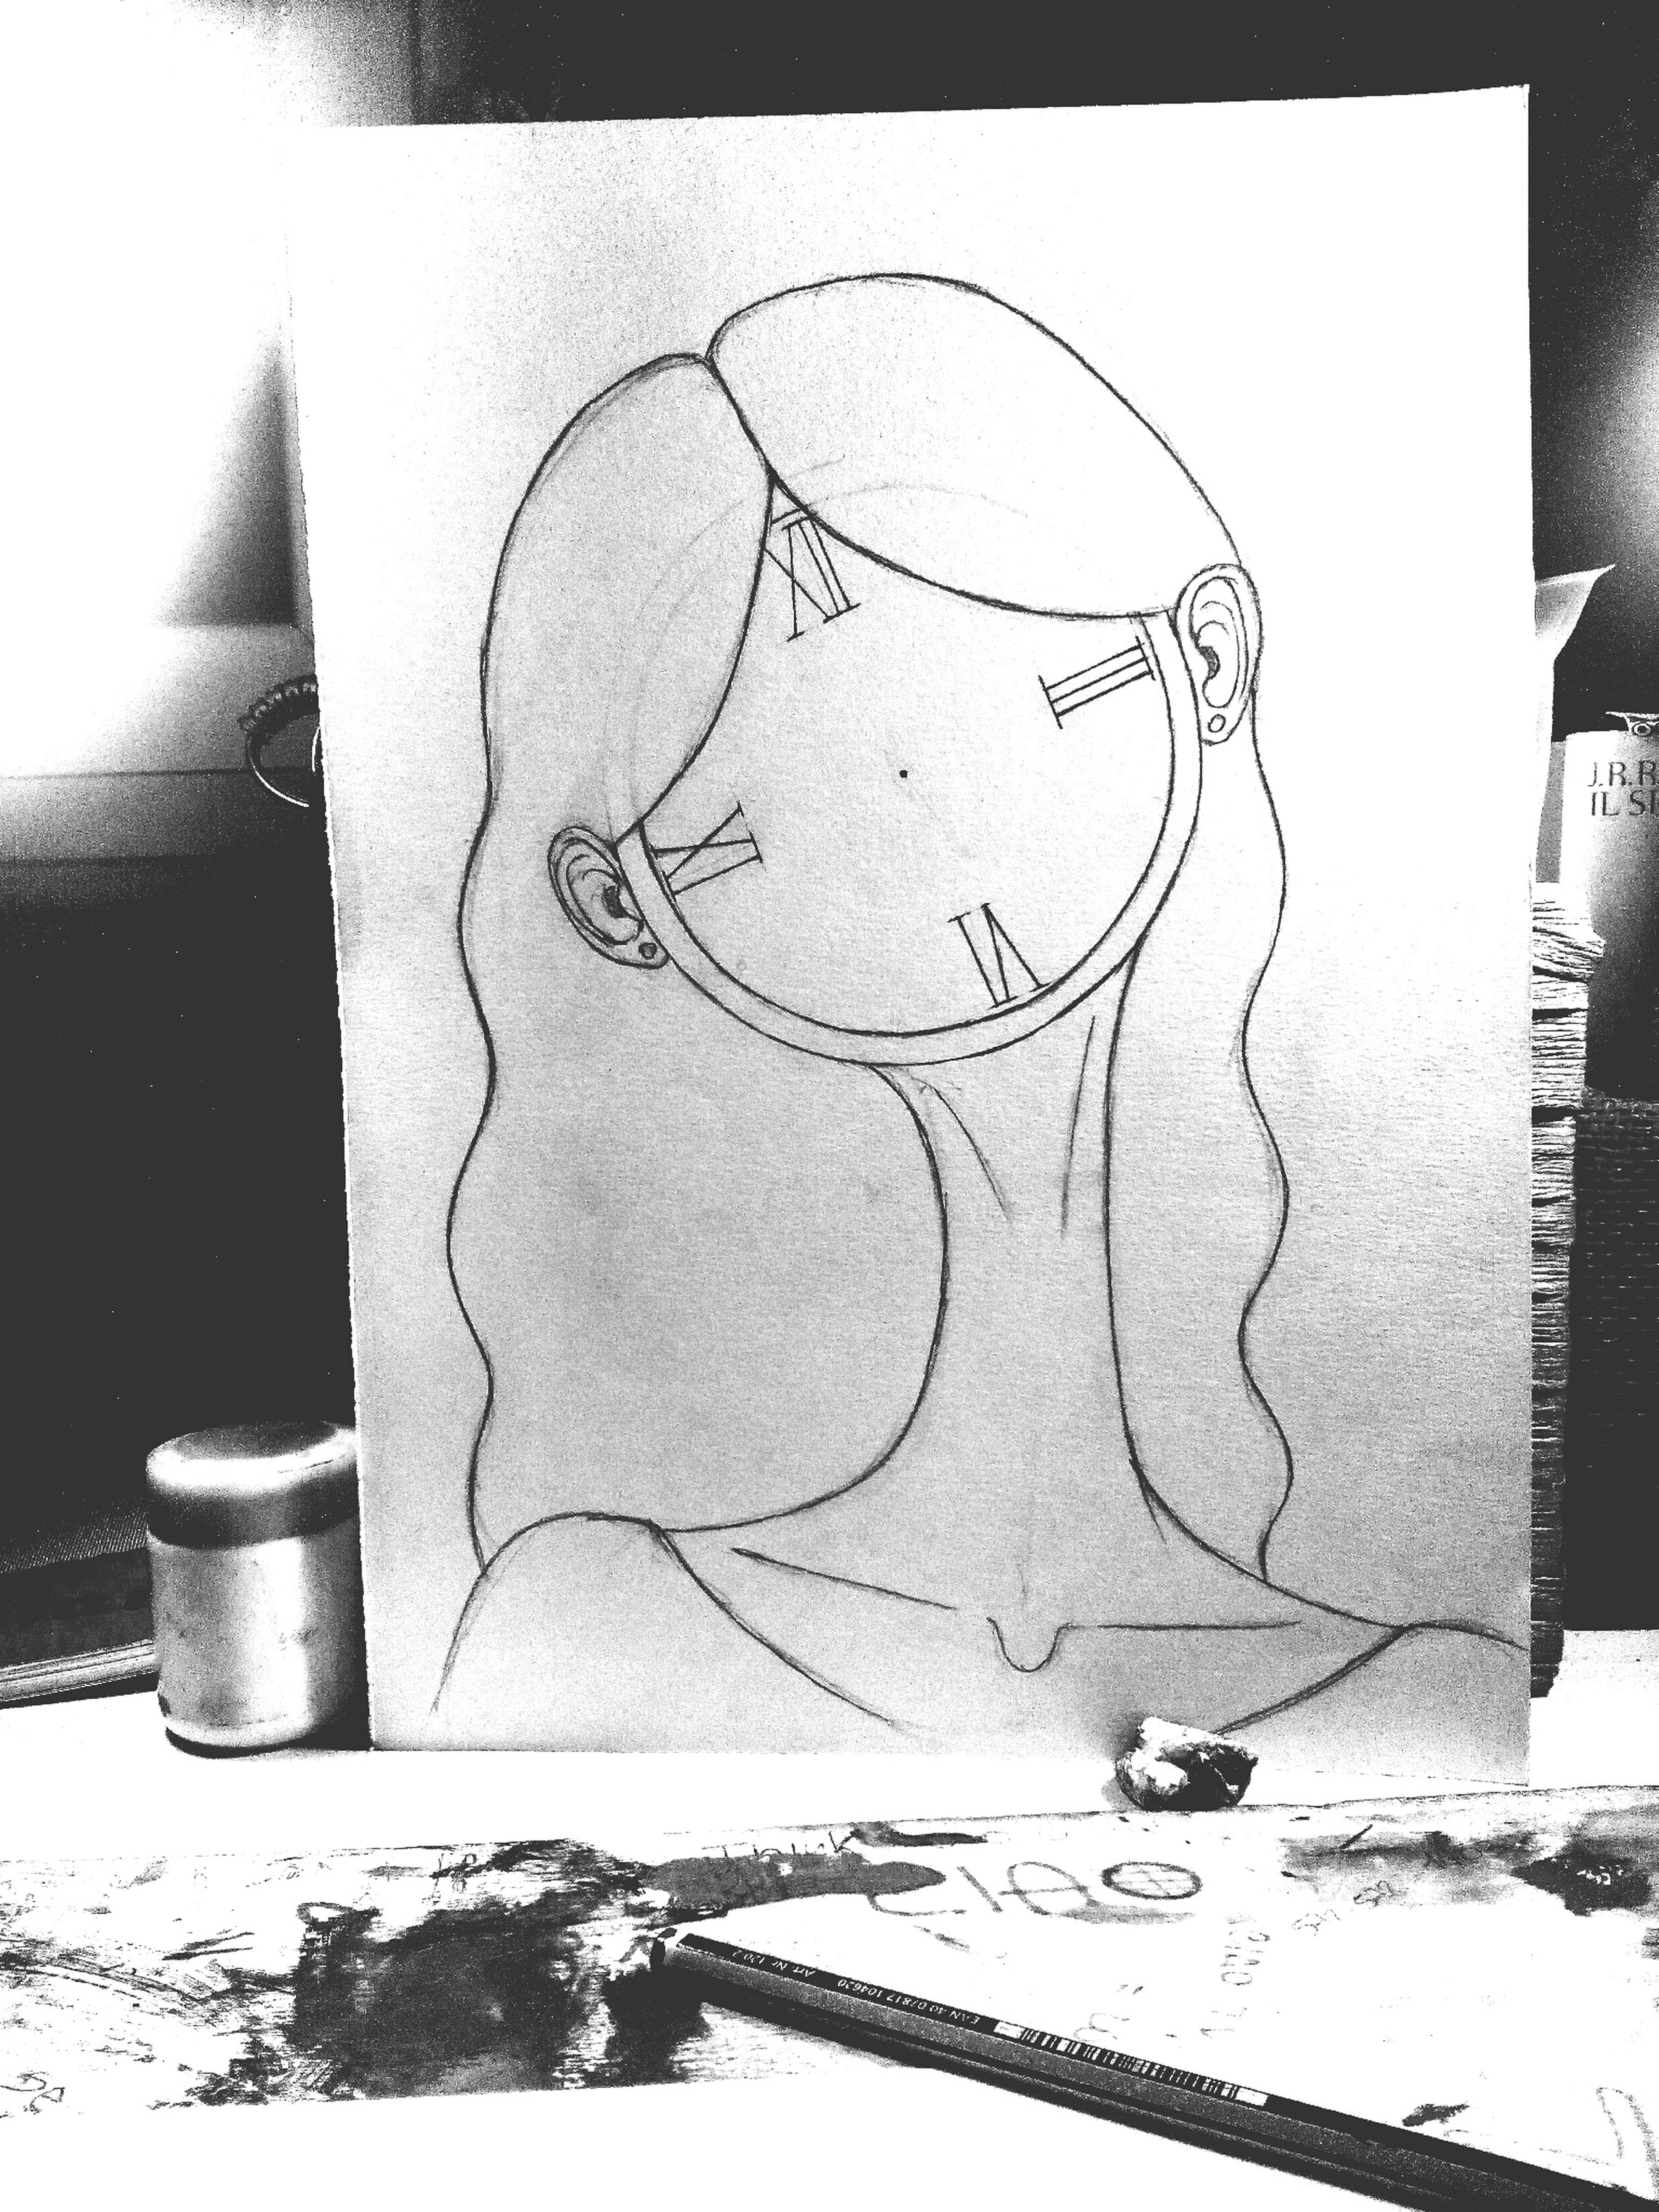 Lady Clok Drowning Imagination Free Imagination